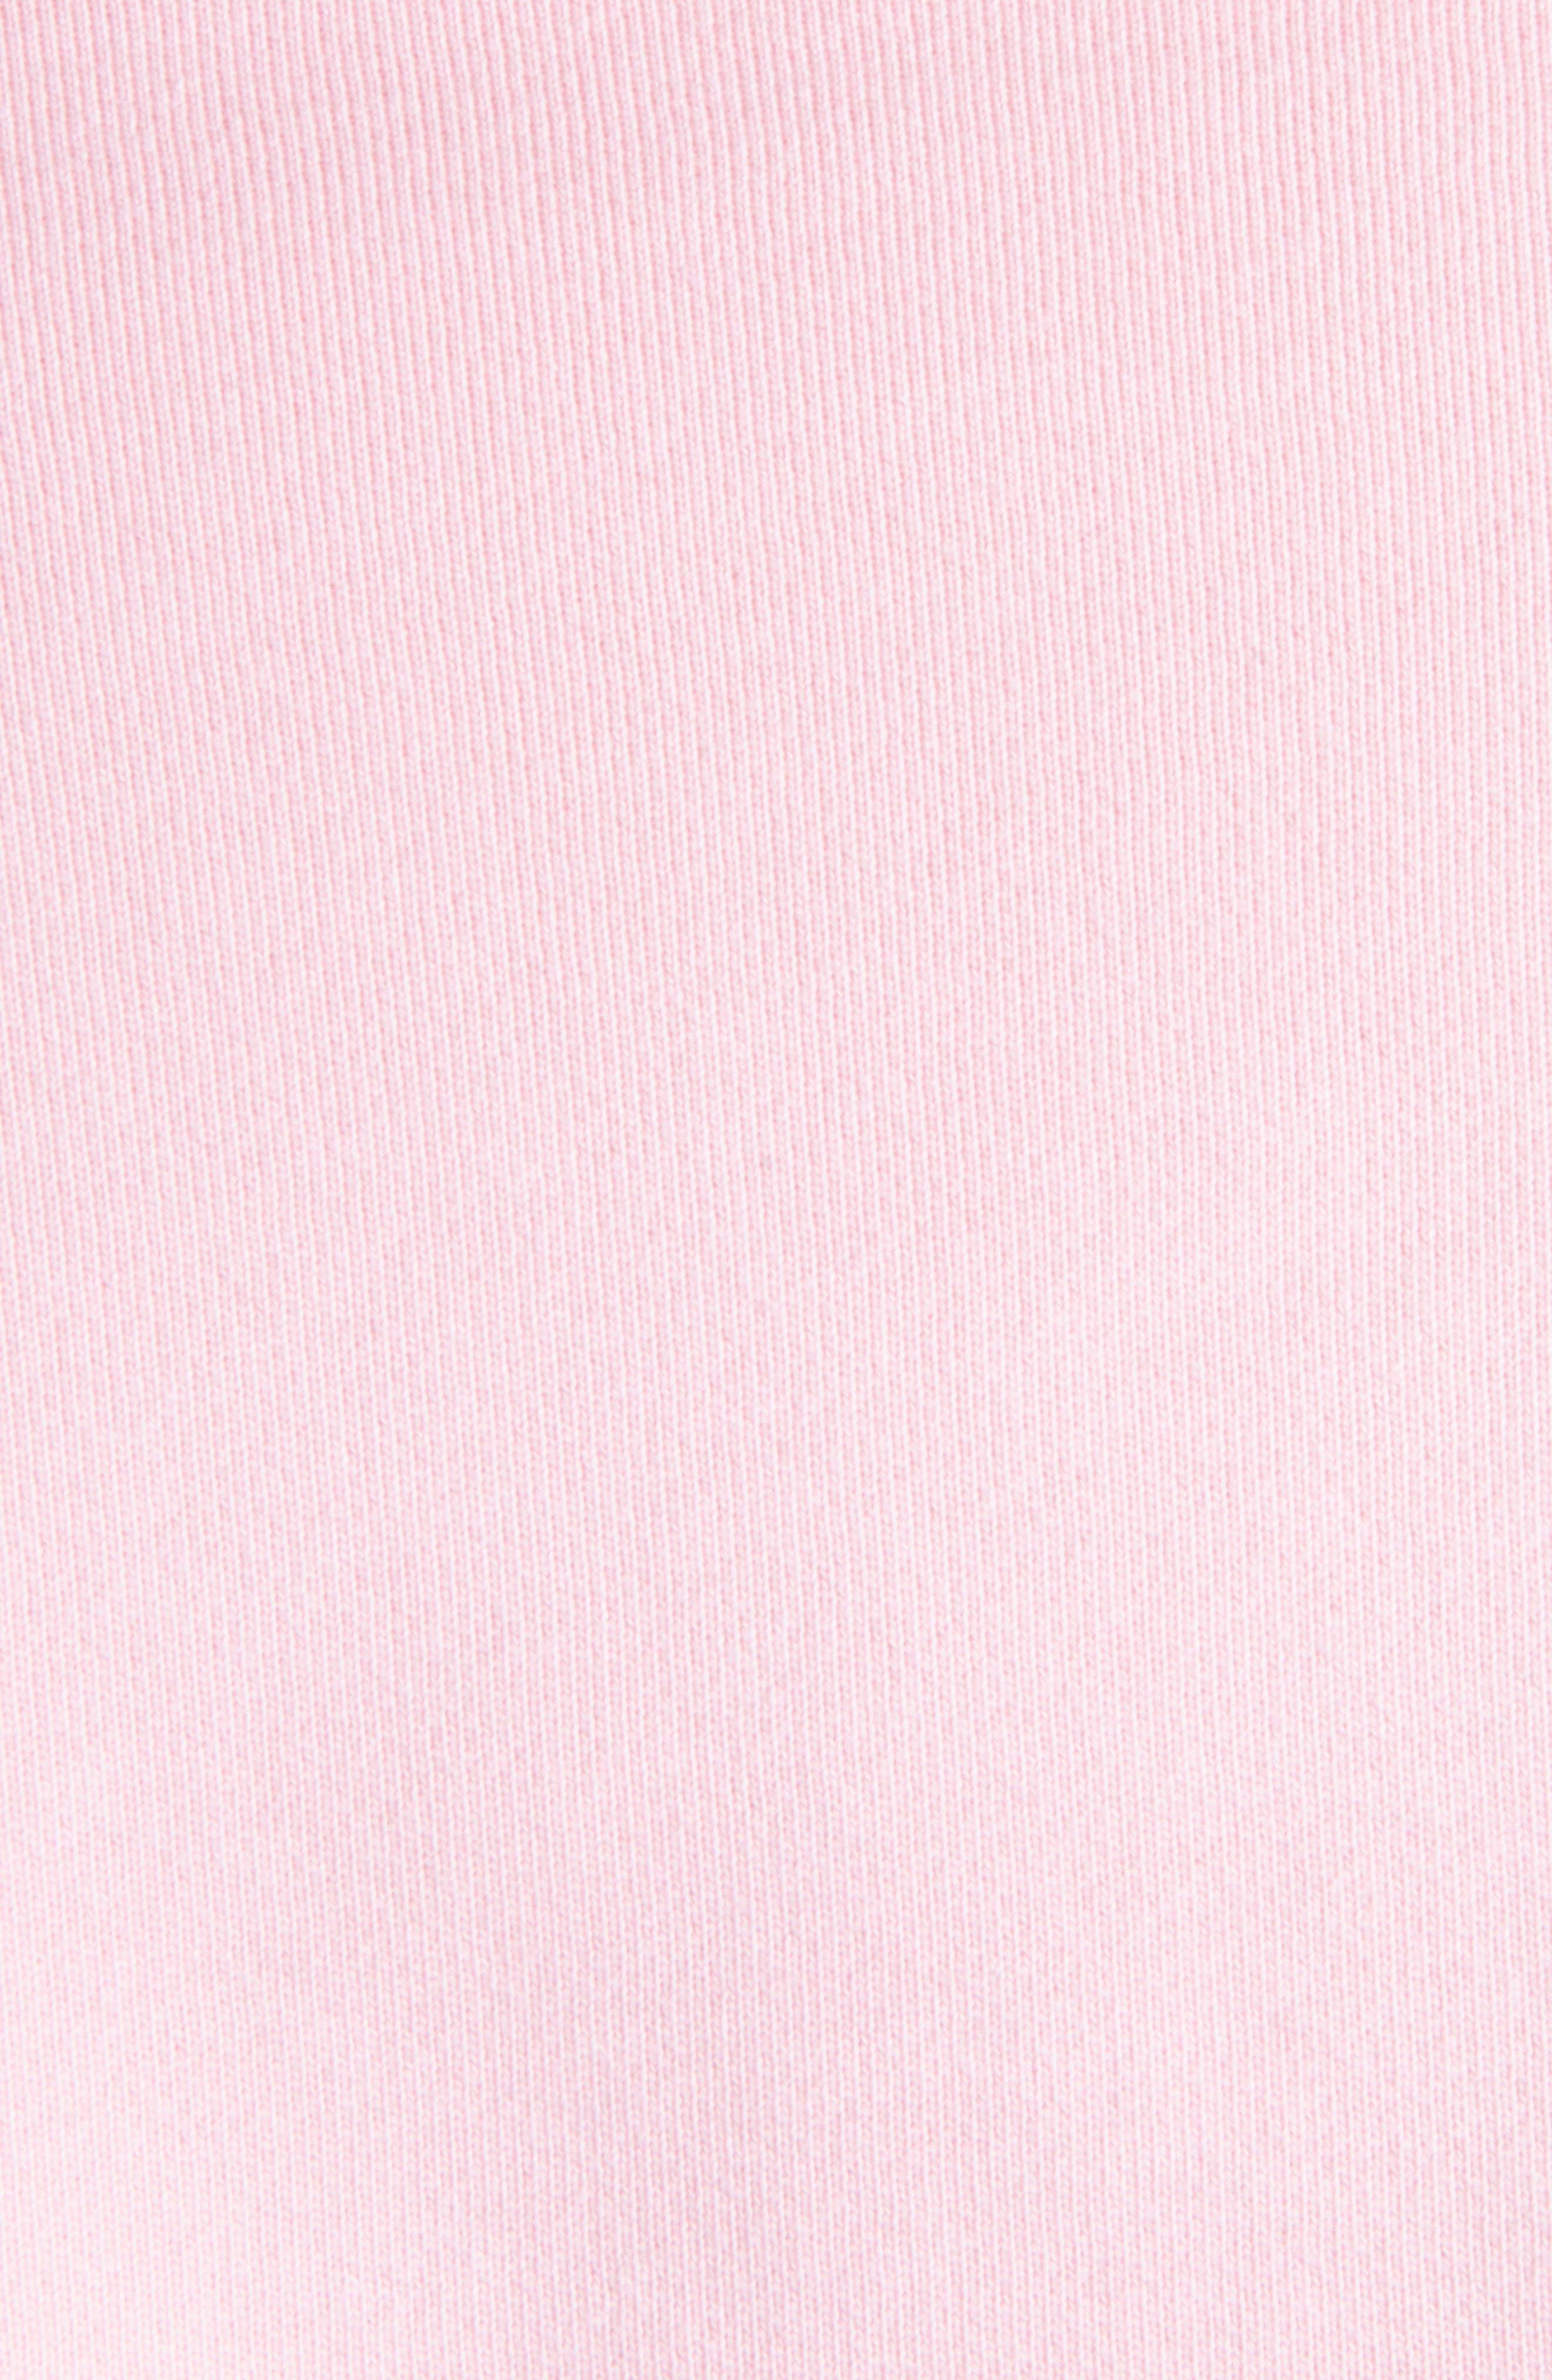 Lorilyn Sweatshirt,                             Alternate thumbnail 4, color,                             699